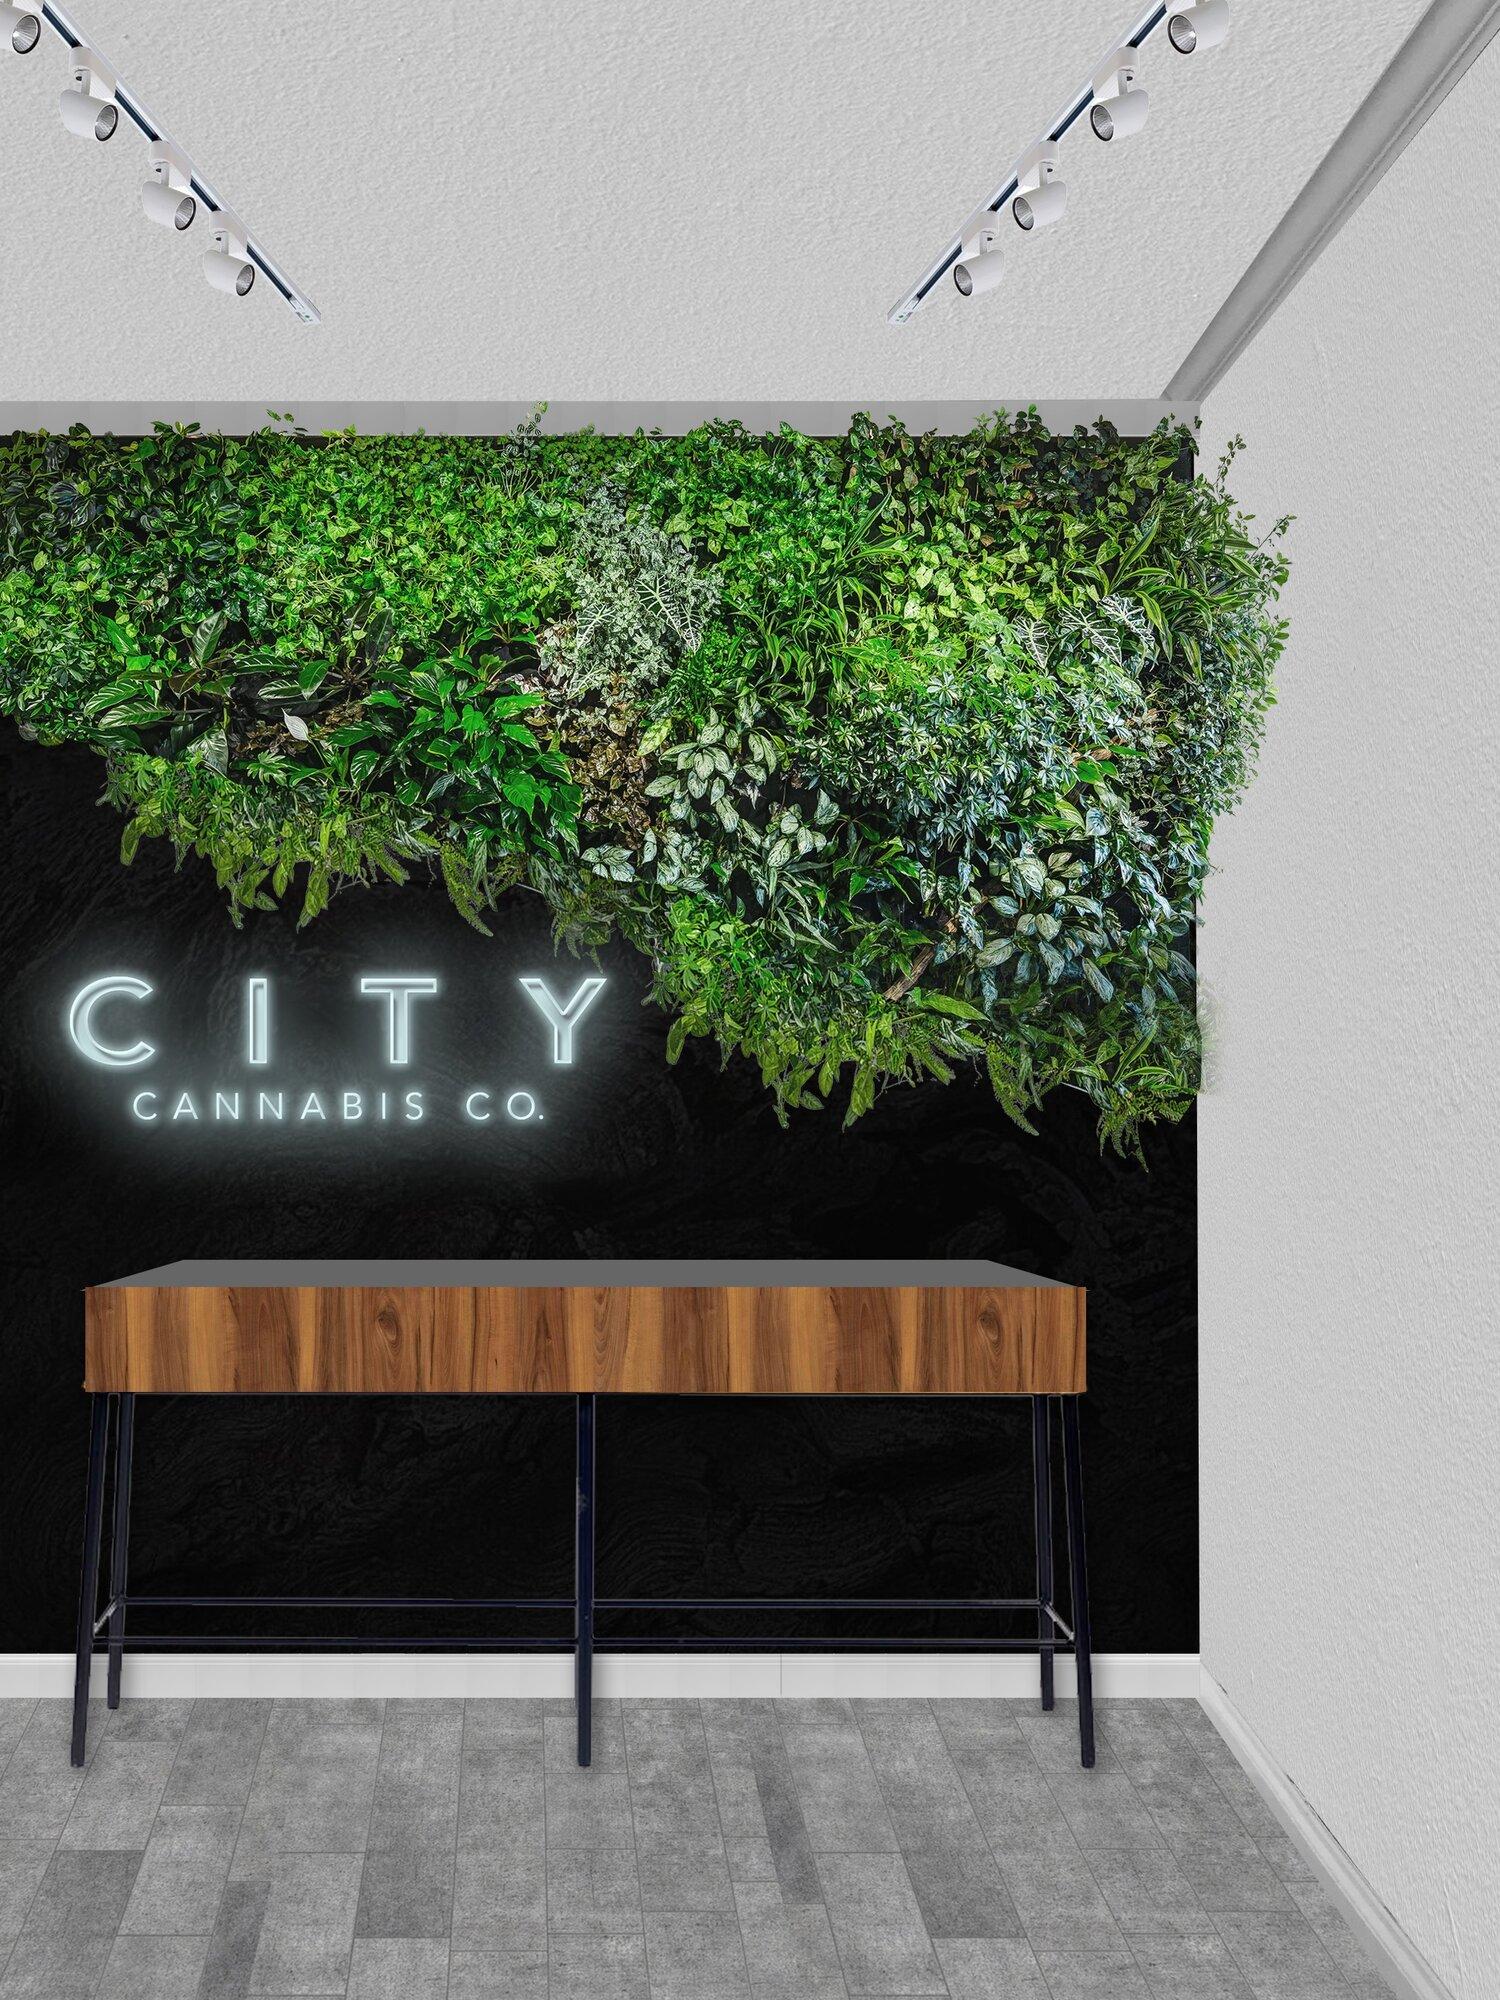 citycannabis_01.jpg